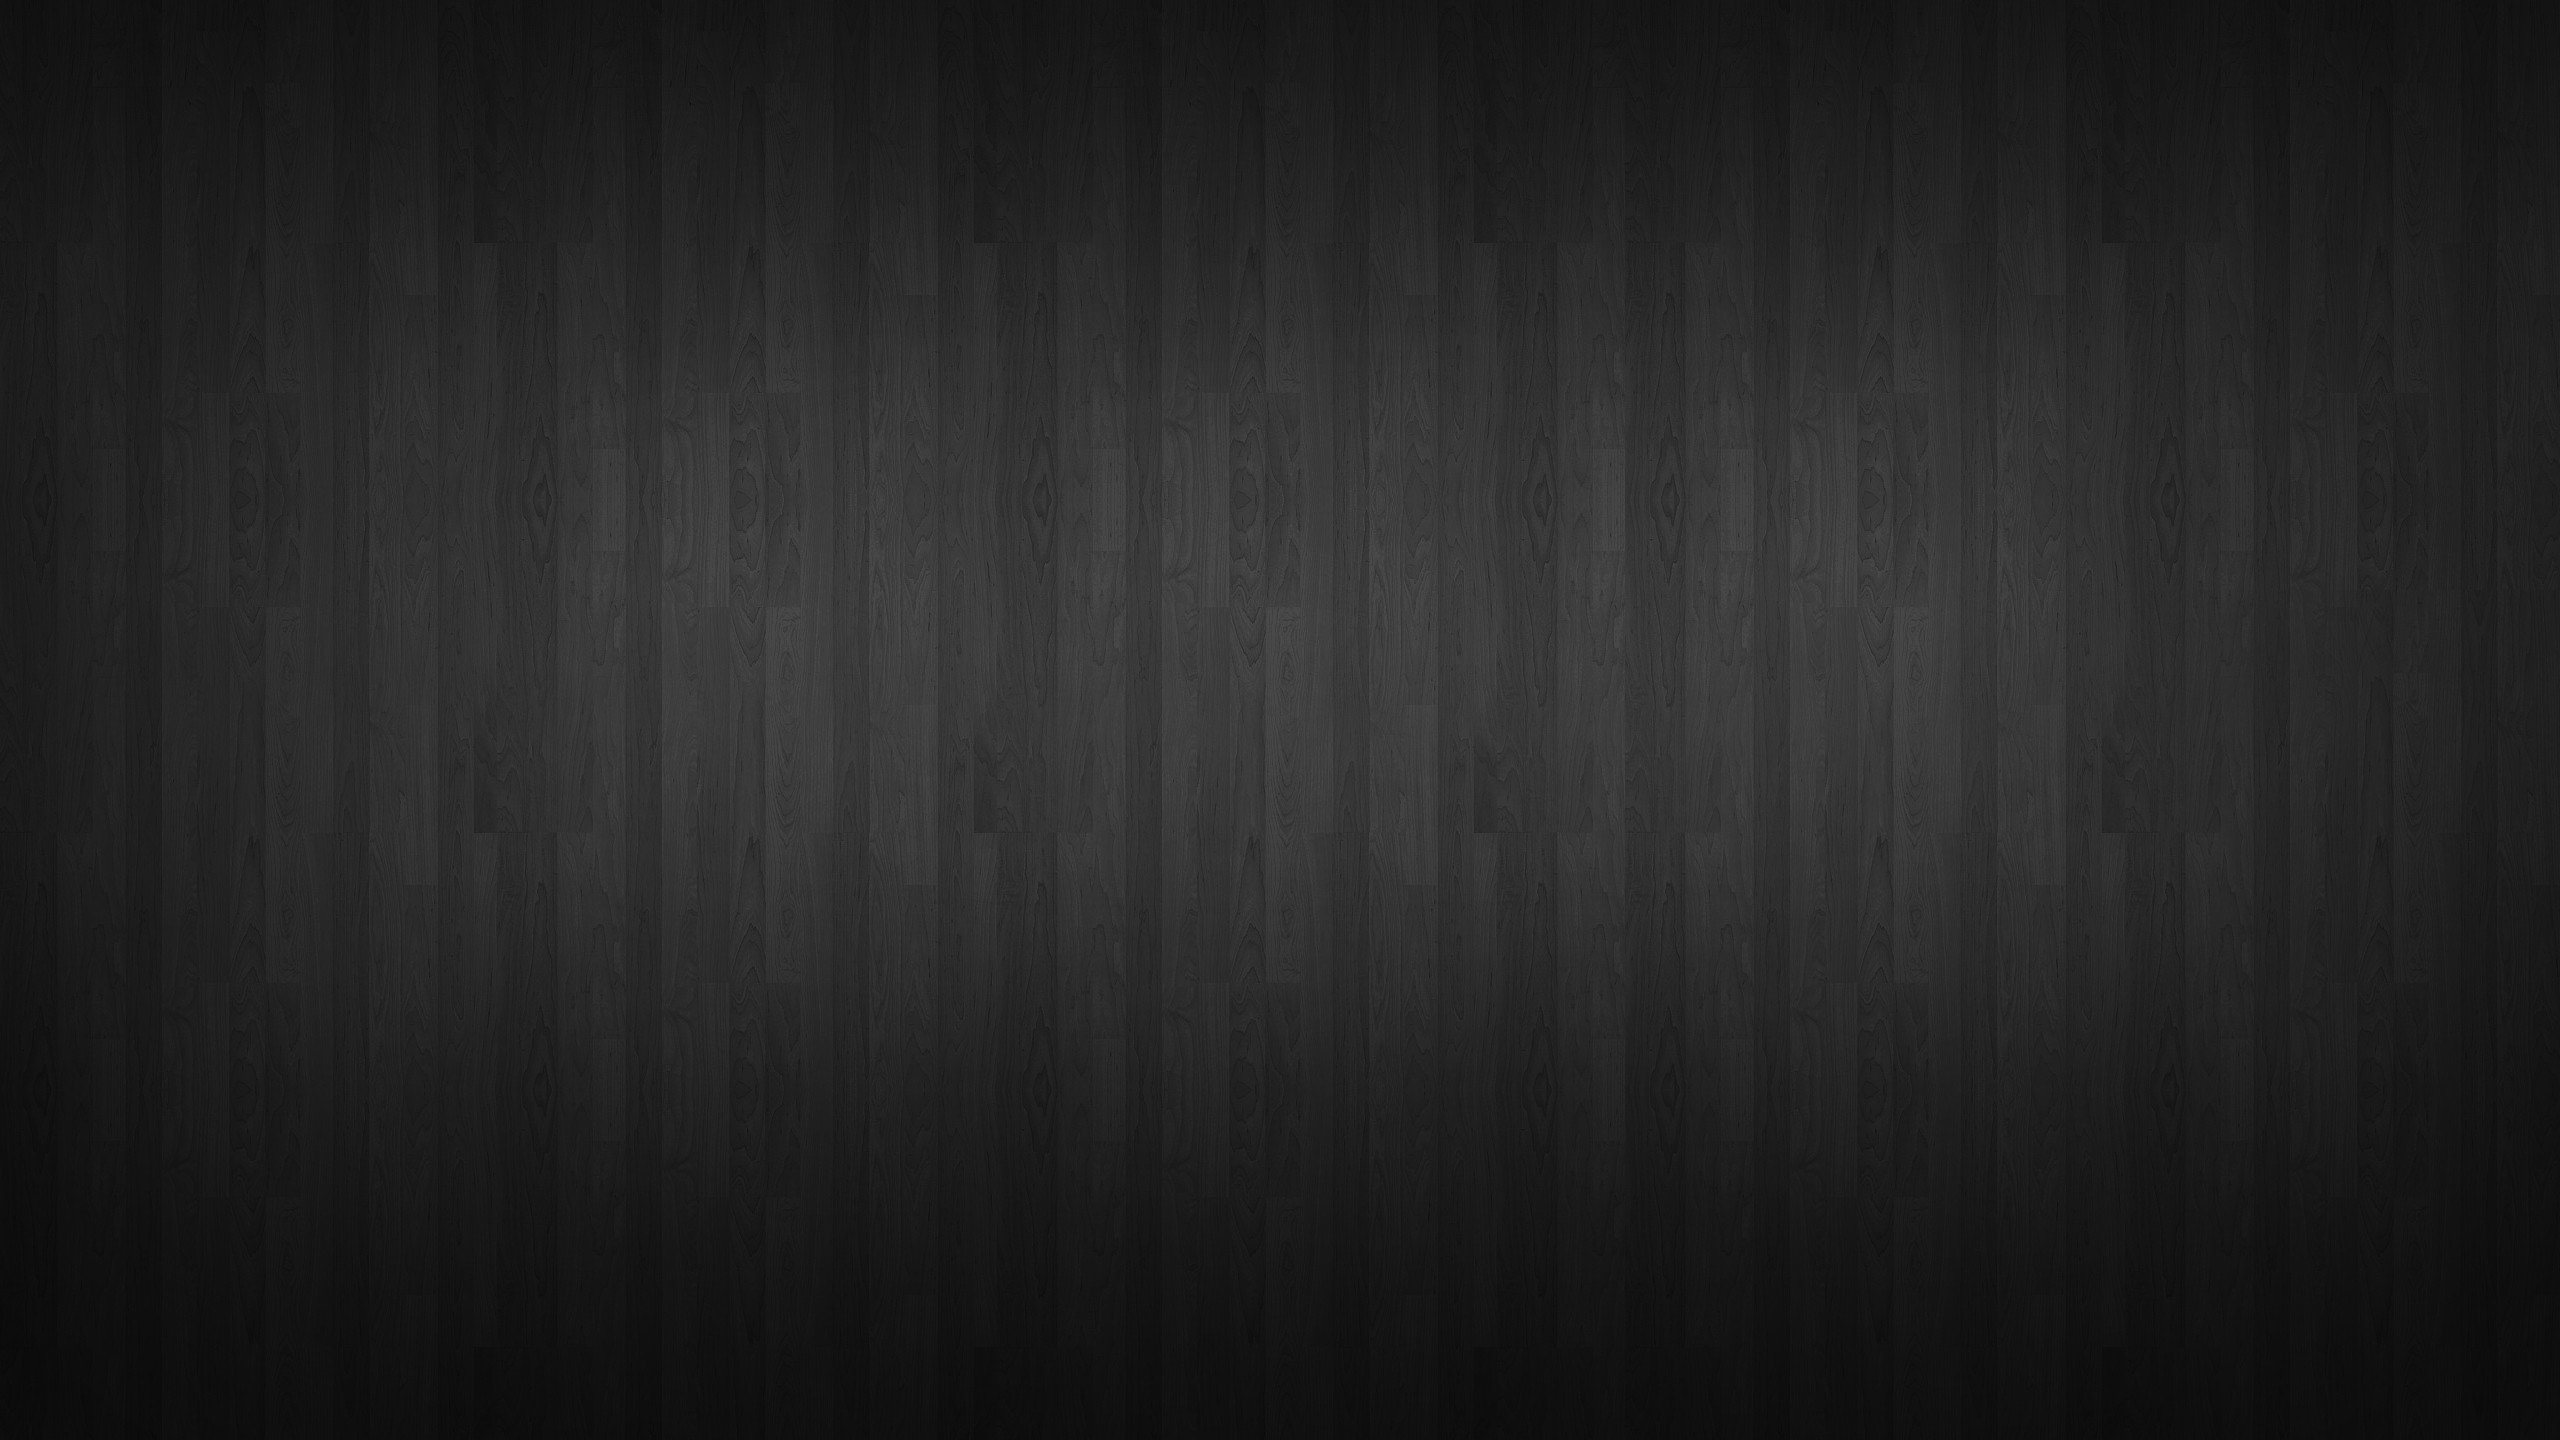 2560x1440 Dark Wallpaper Posted By Zoey Mercado